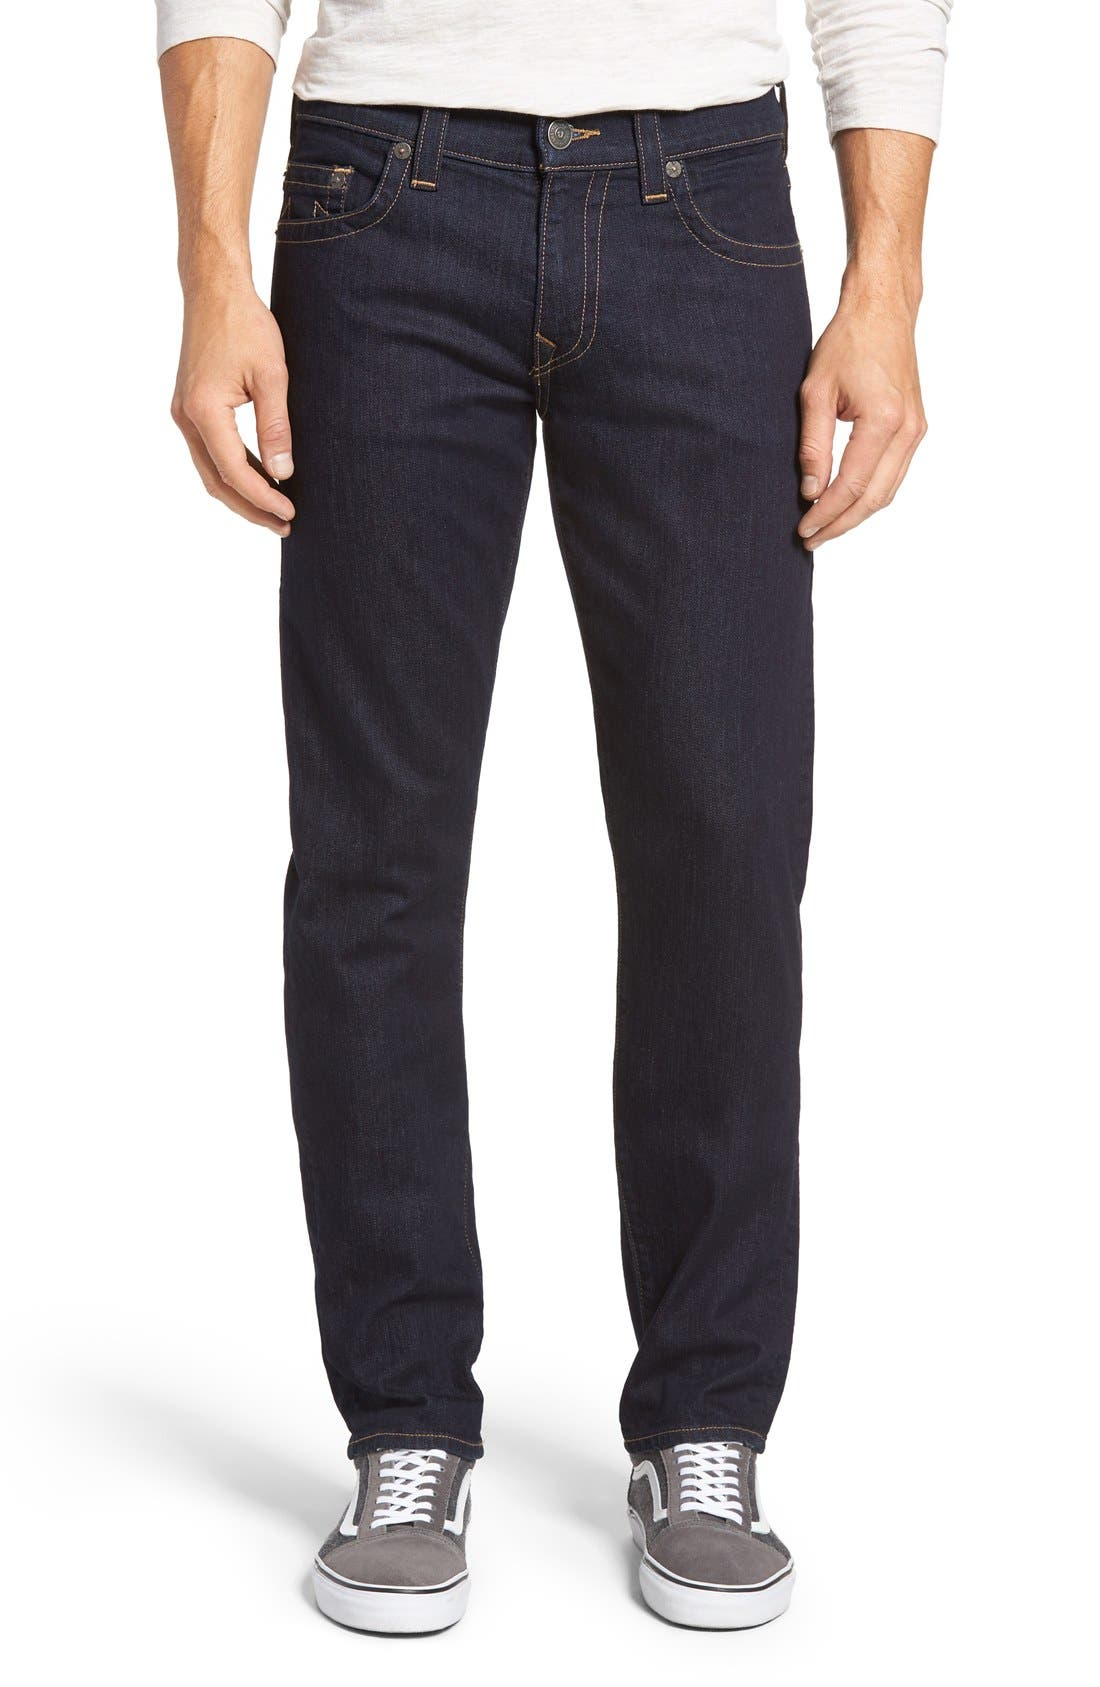 Geno Straight Leg Jeans,                         Main,                         color, 2S Body Rinse